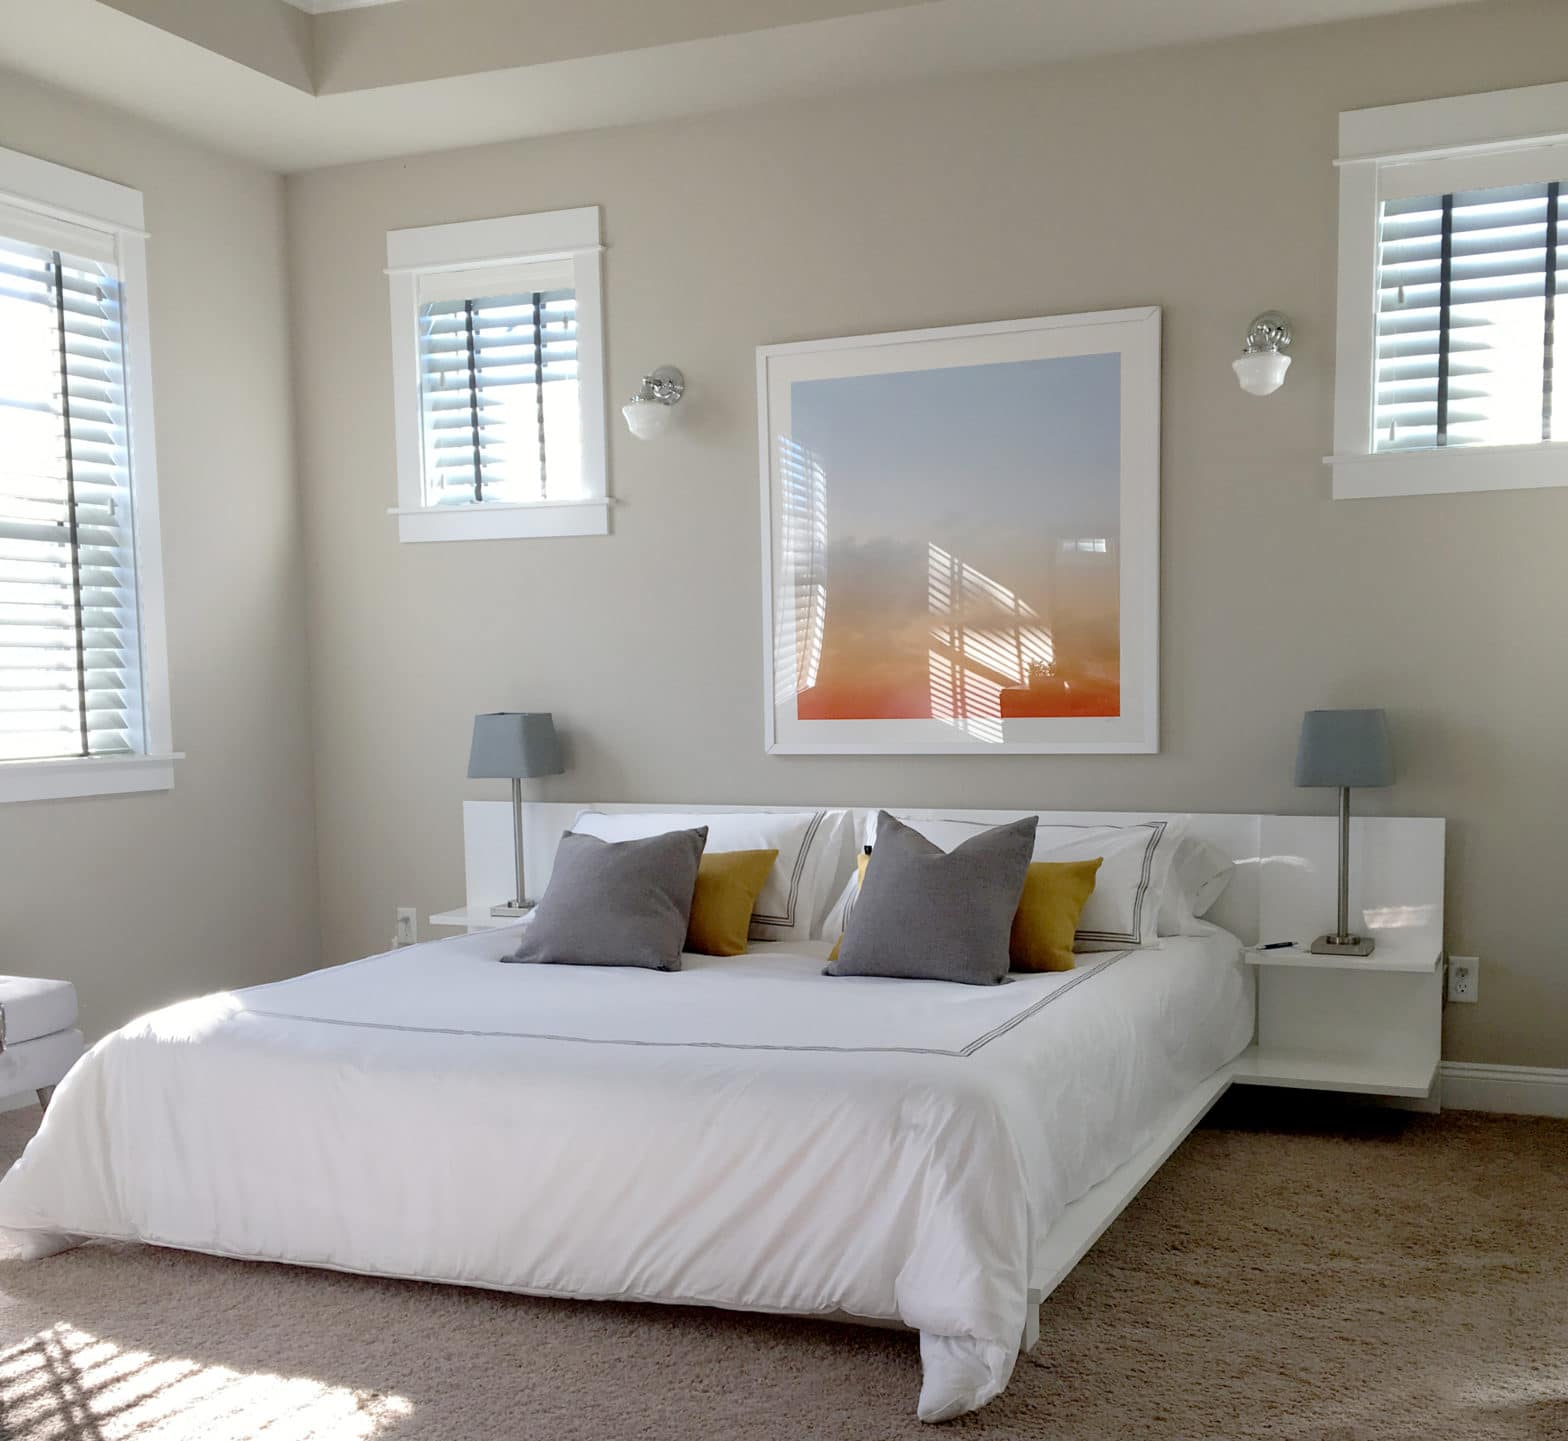 Light-filled master bedroom with colorful artwork